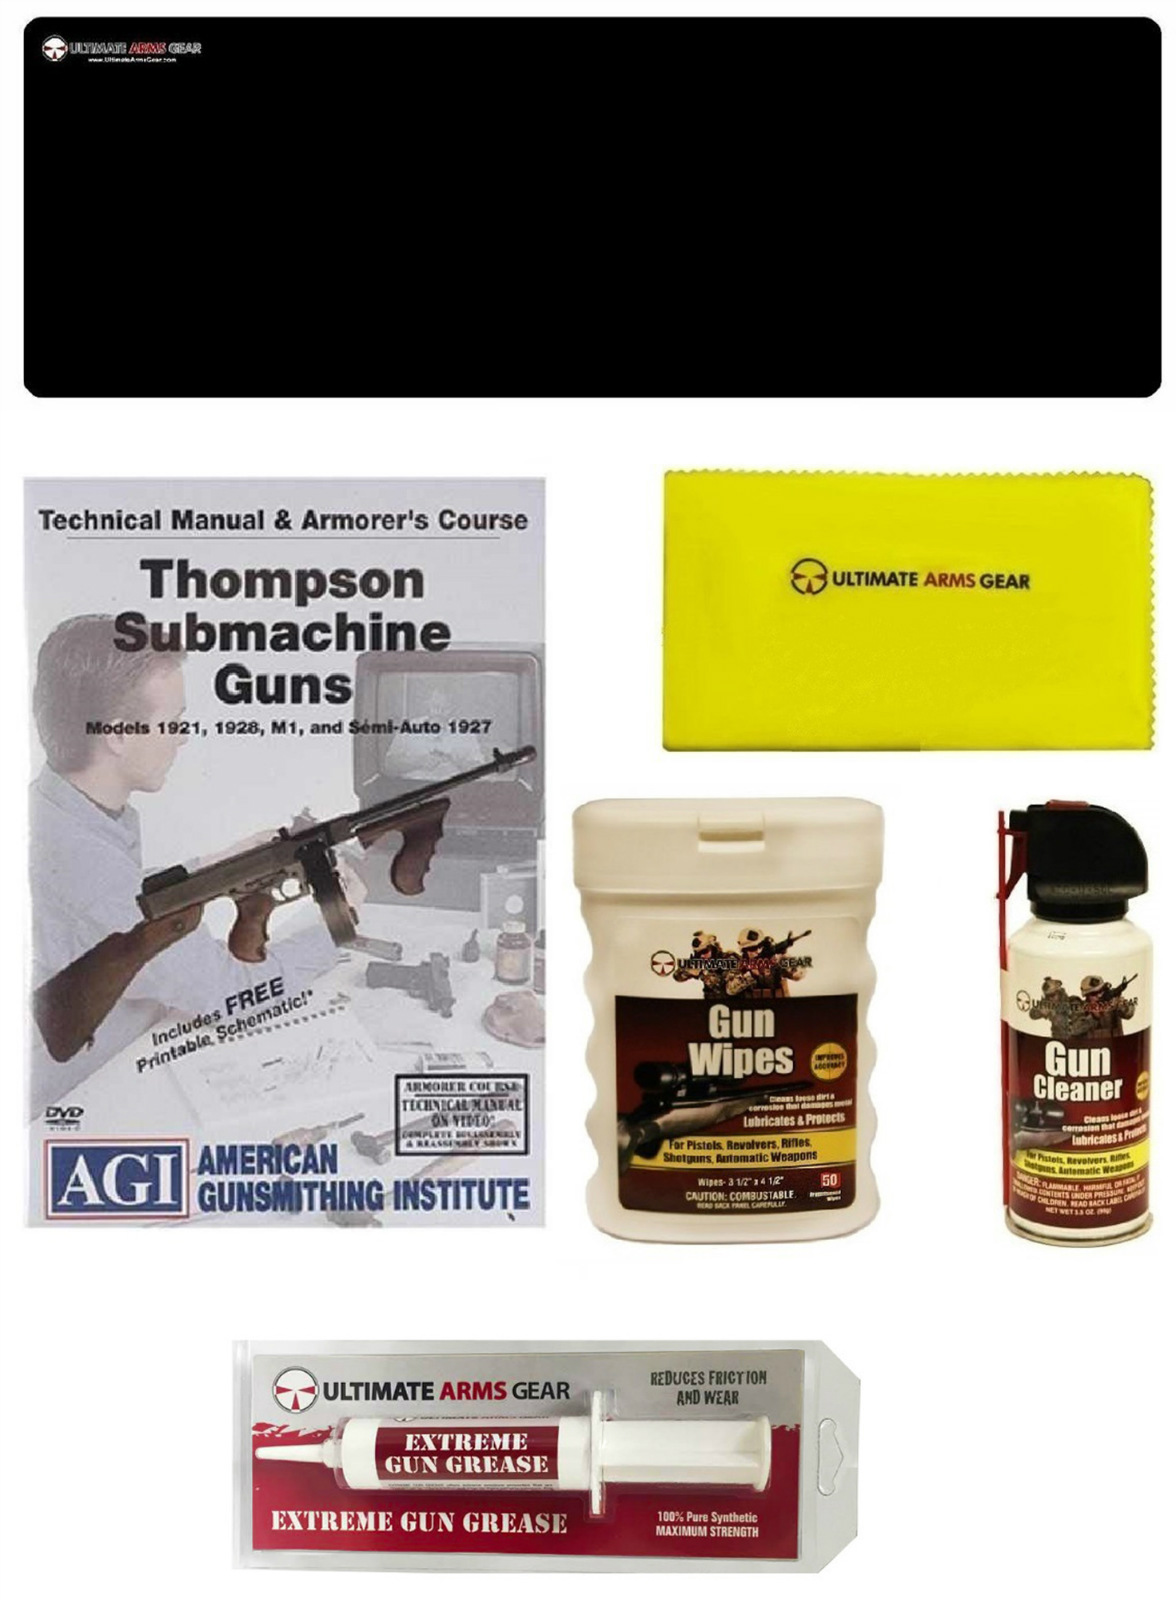 AmeriGunsmithing Institute DVD Manual Course Thompson Submachine Gun + Ultimate Arms Gear Gunsmith Cleaning Gun Mat +... by